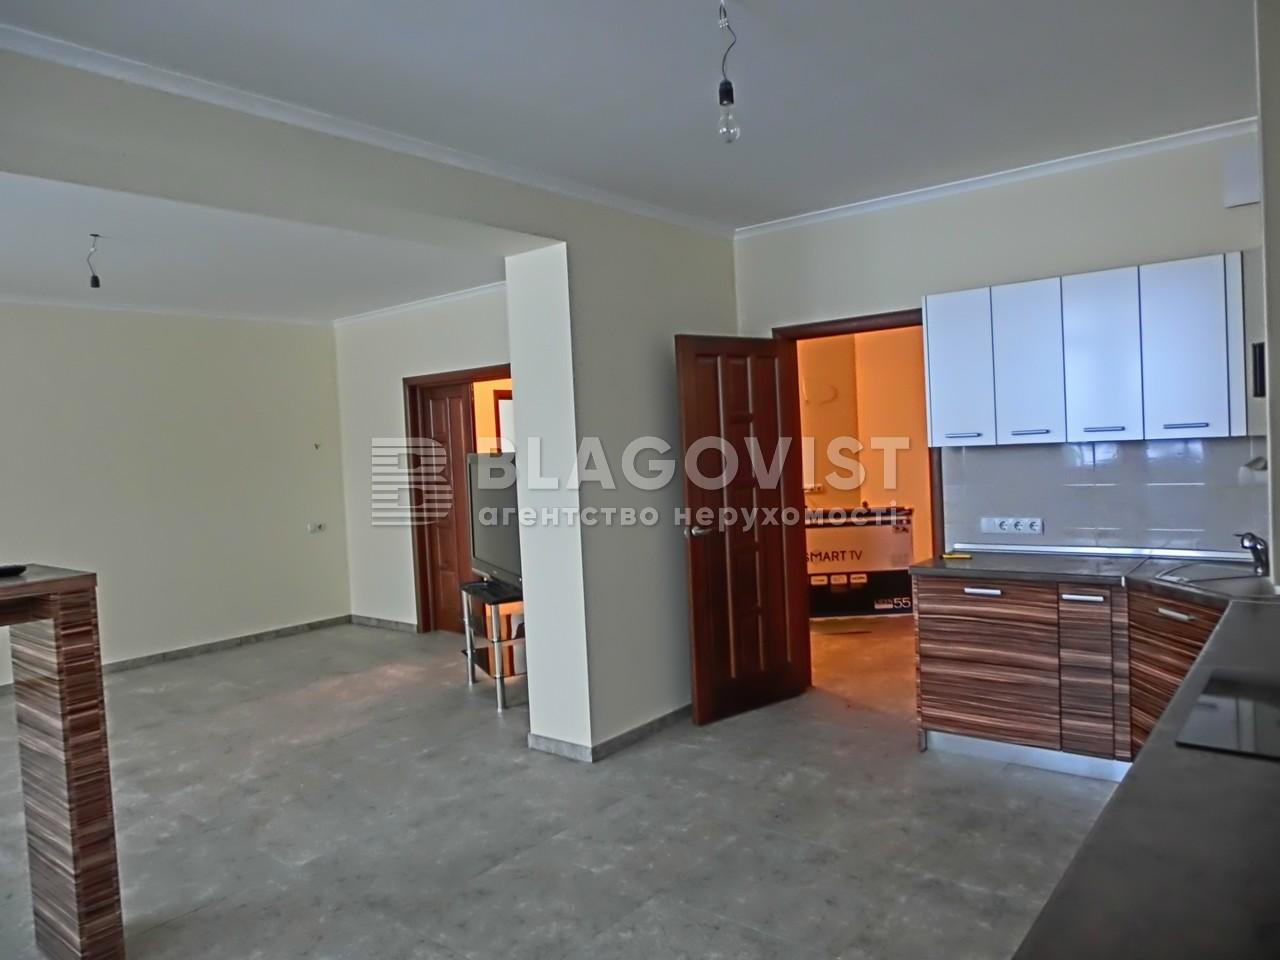 Квартира R-23173, Ушакова Николая, 1б, Киев - Фото 8